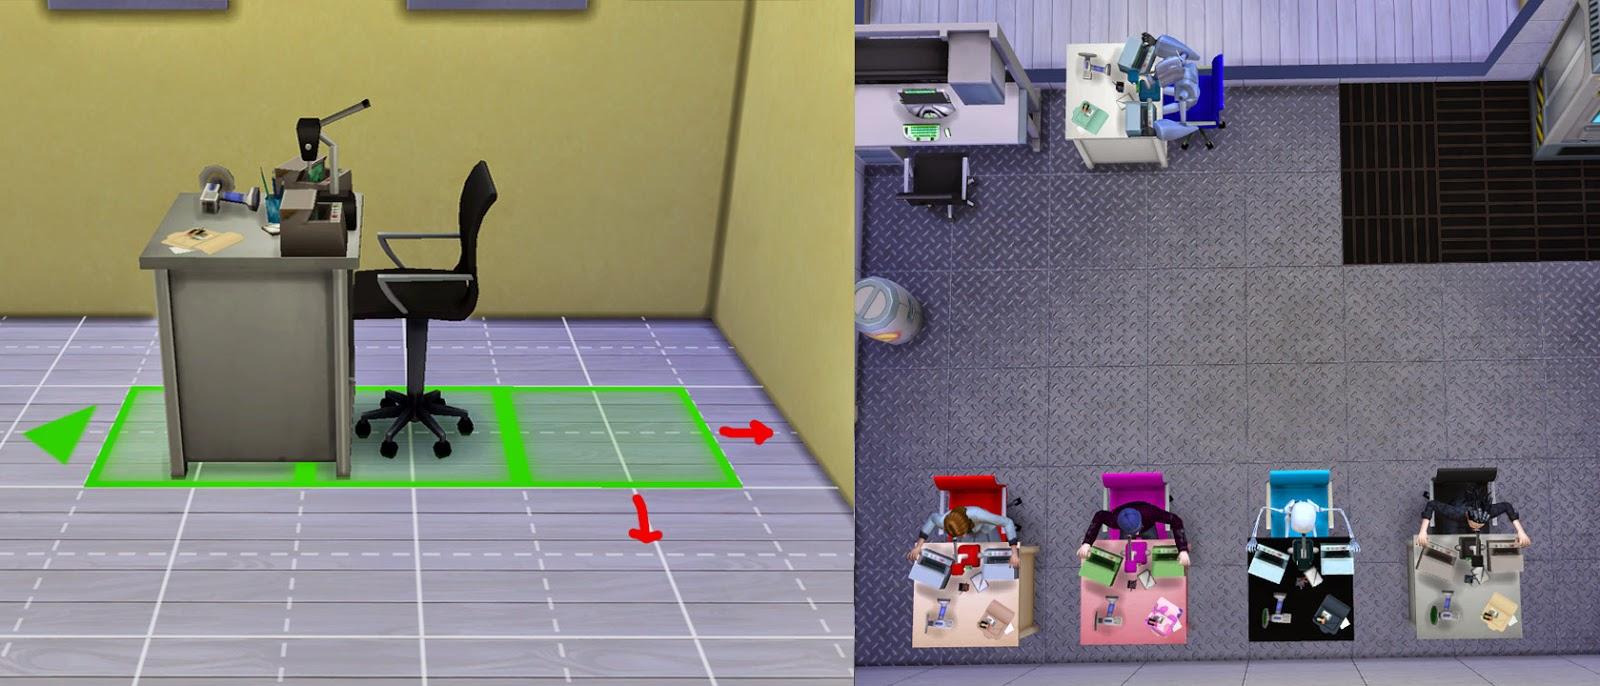 My Sims 4 Blog: Smaller Microscope Alternative by Esmeralda